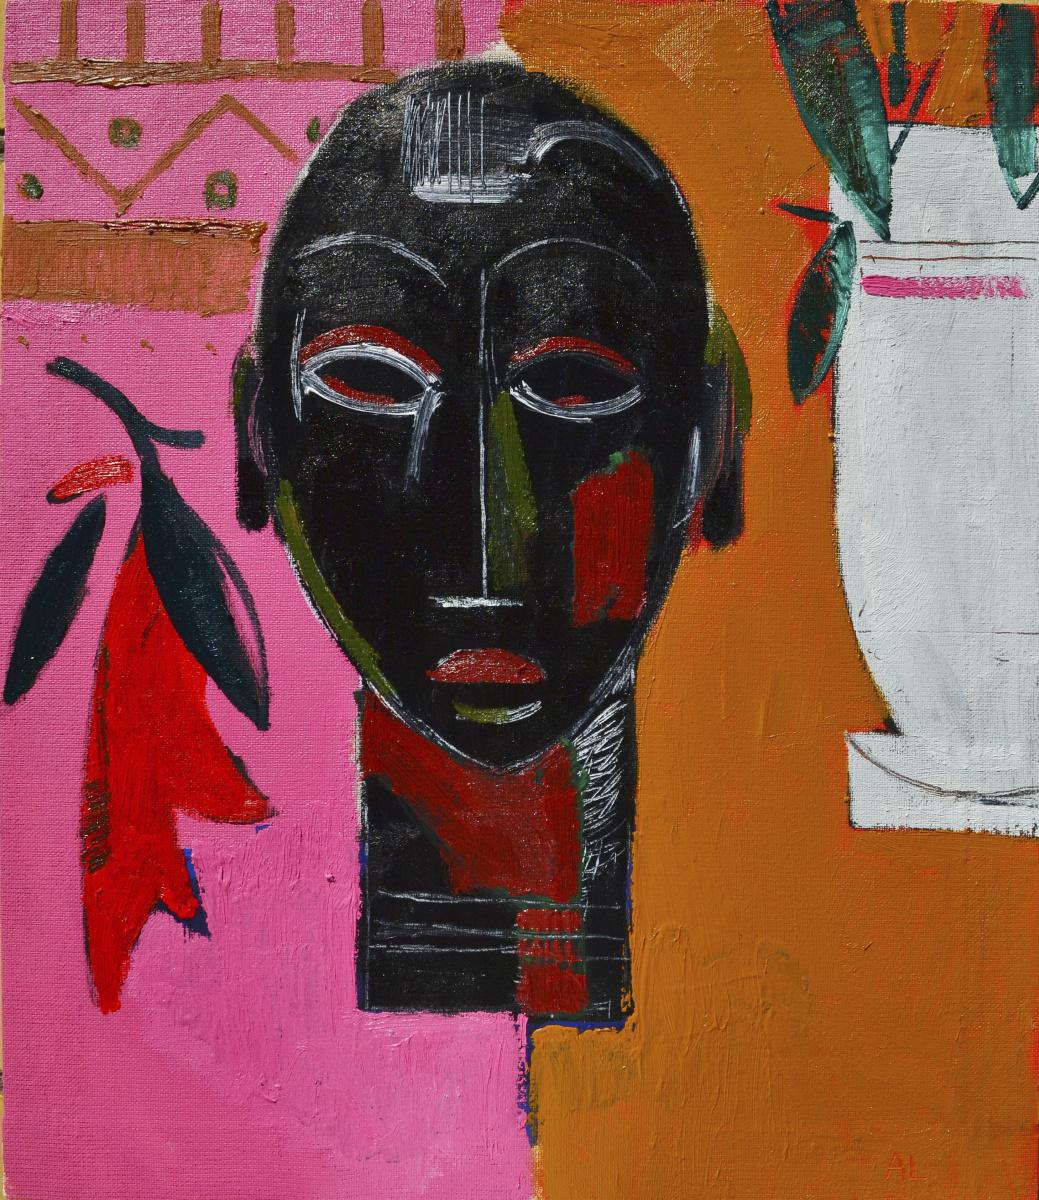 Alexandr Petelin. The sculpture: self portrait